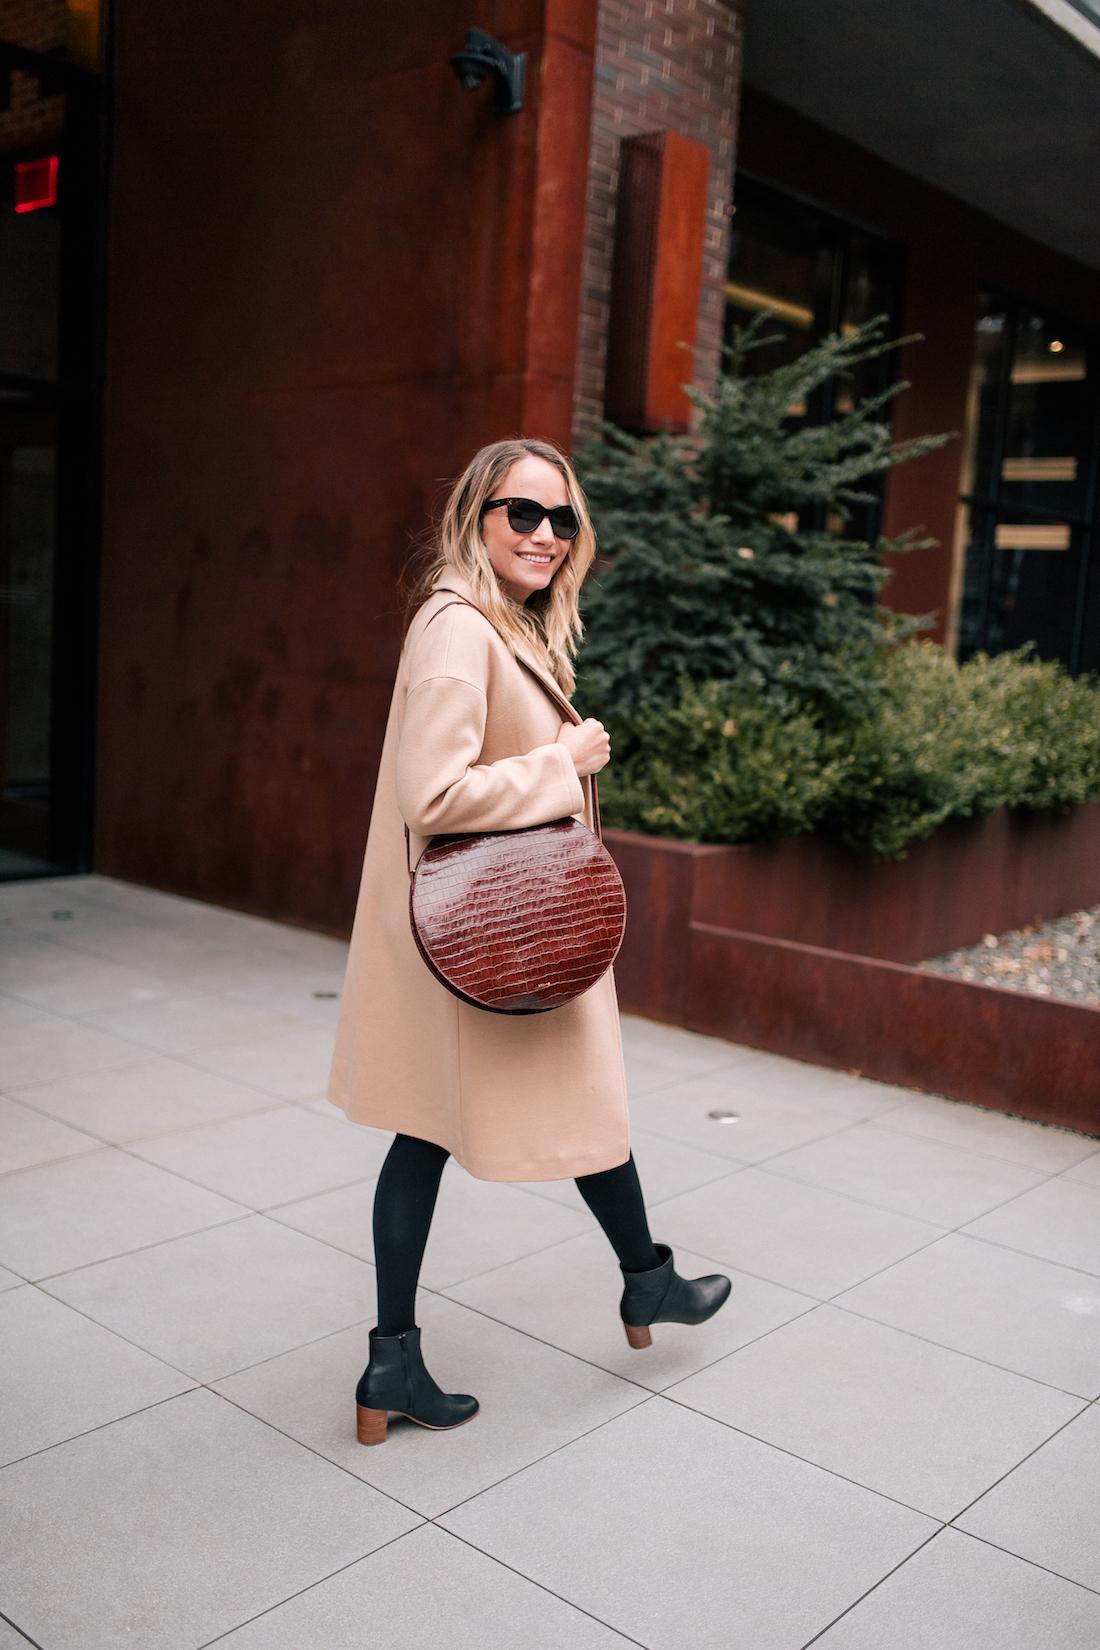 Outfit Details: Topshop Camel Coat